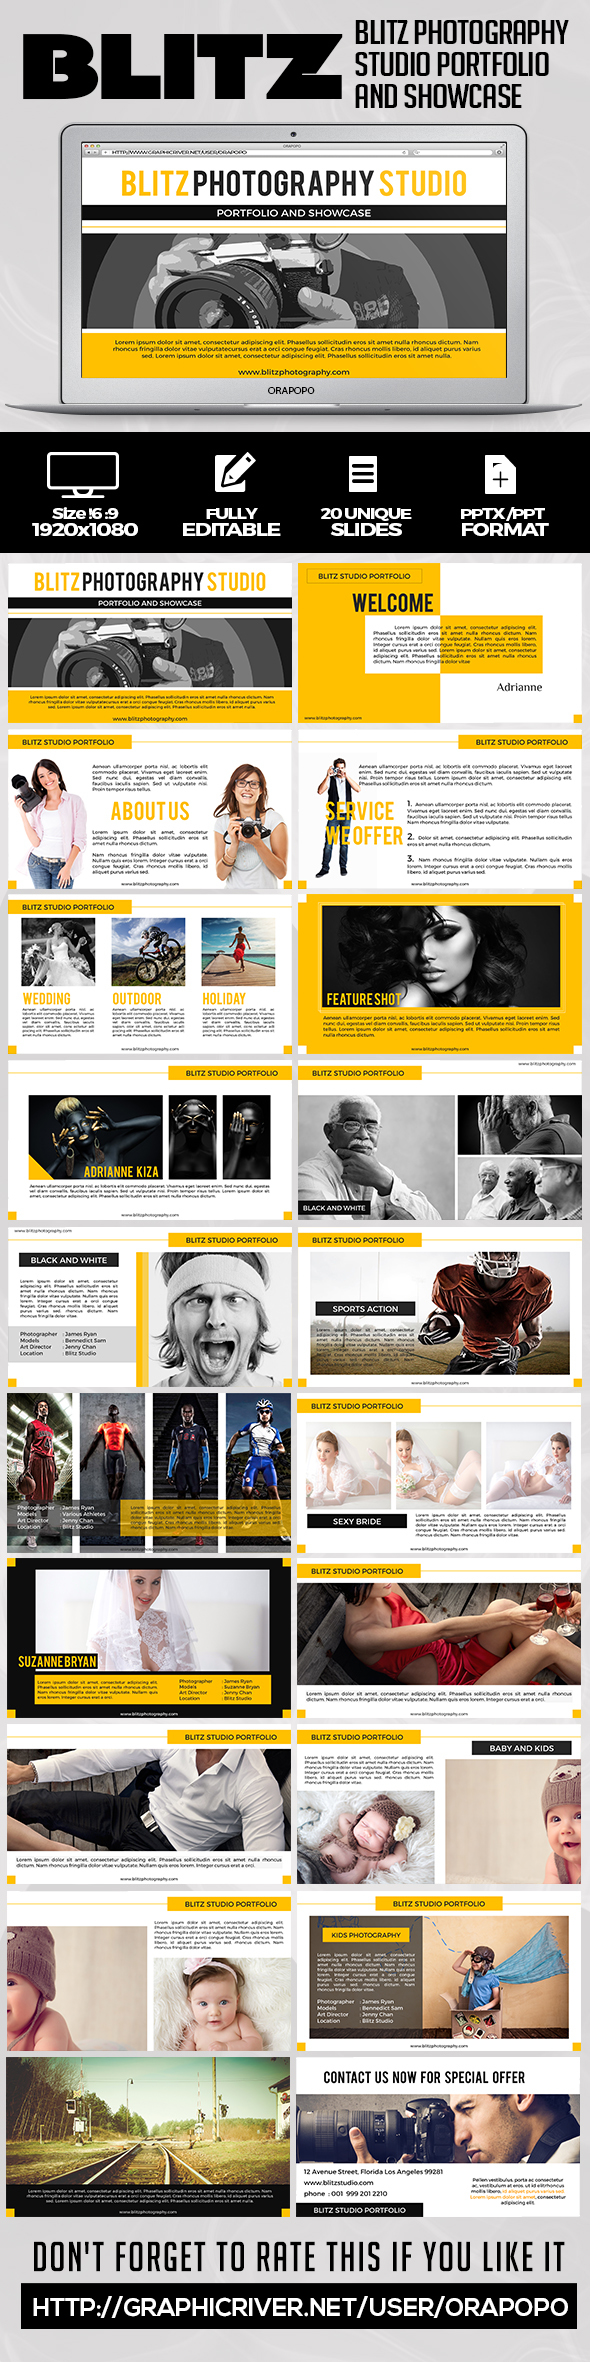 Blitz Photography Studio Portfolio and Showcase  - Creative PowerPoint Templates